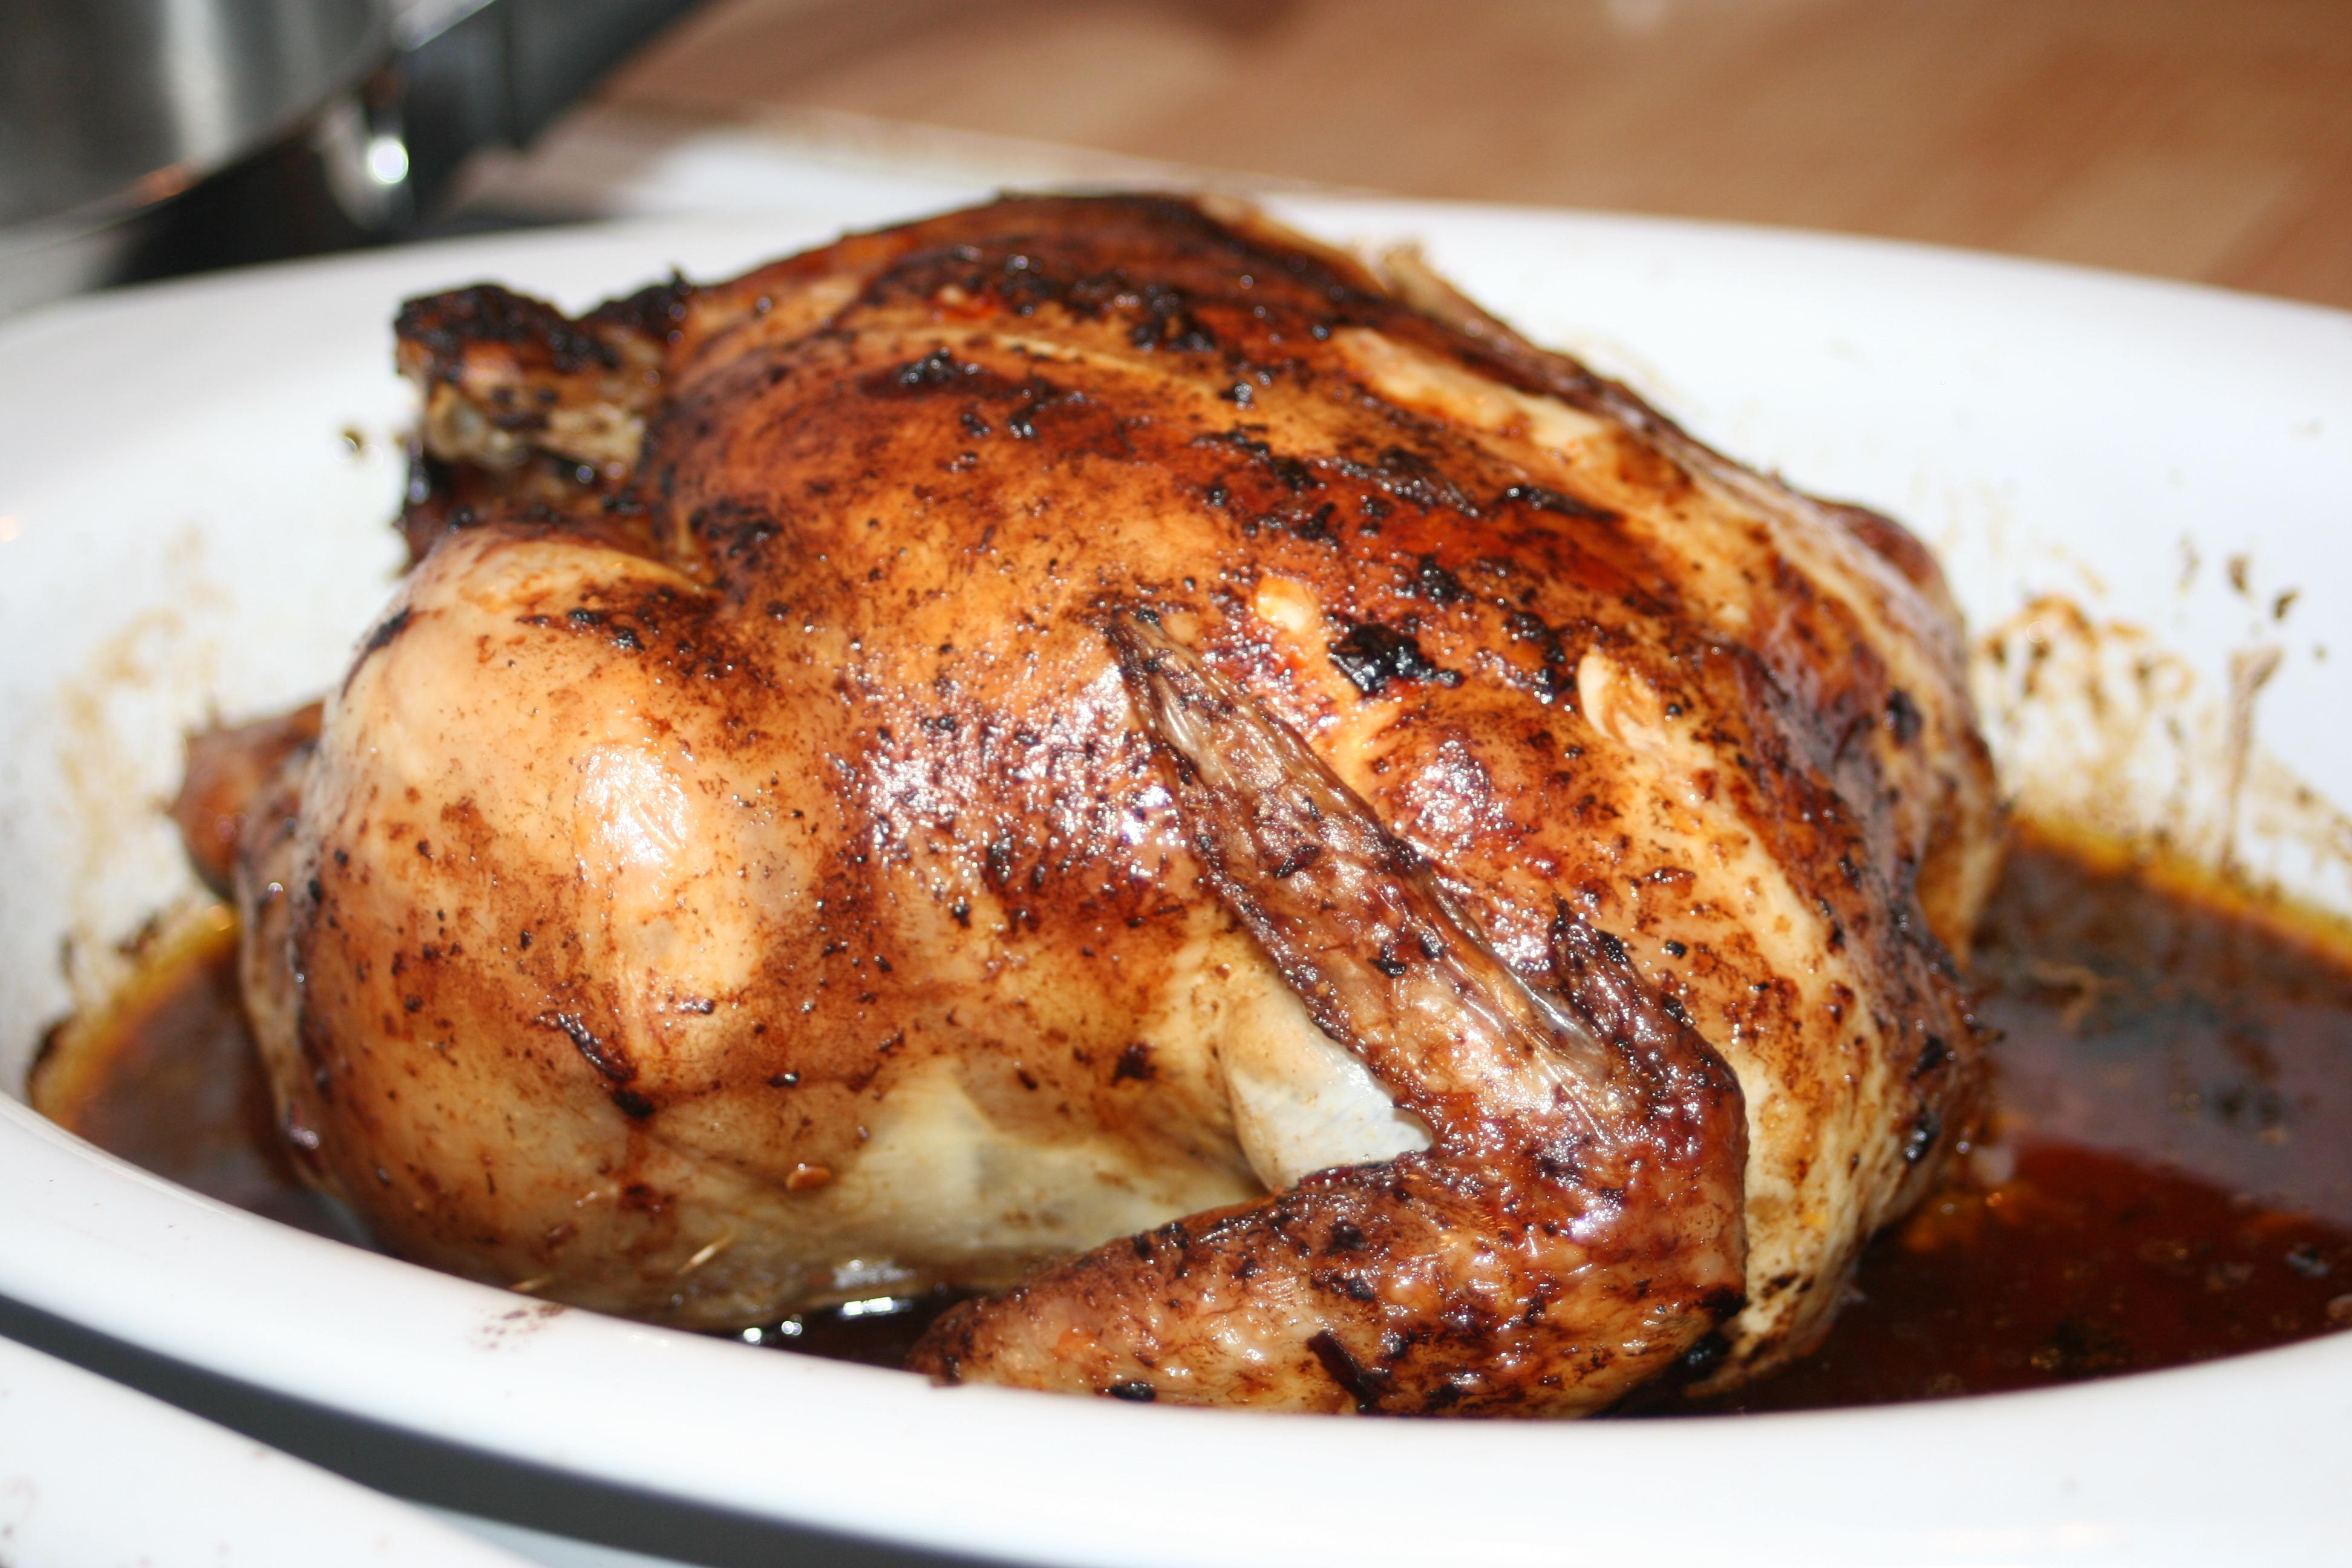 steka hel kyckling i ugn